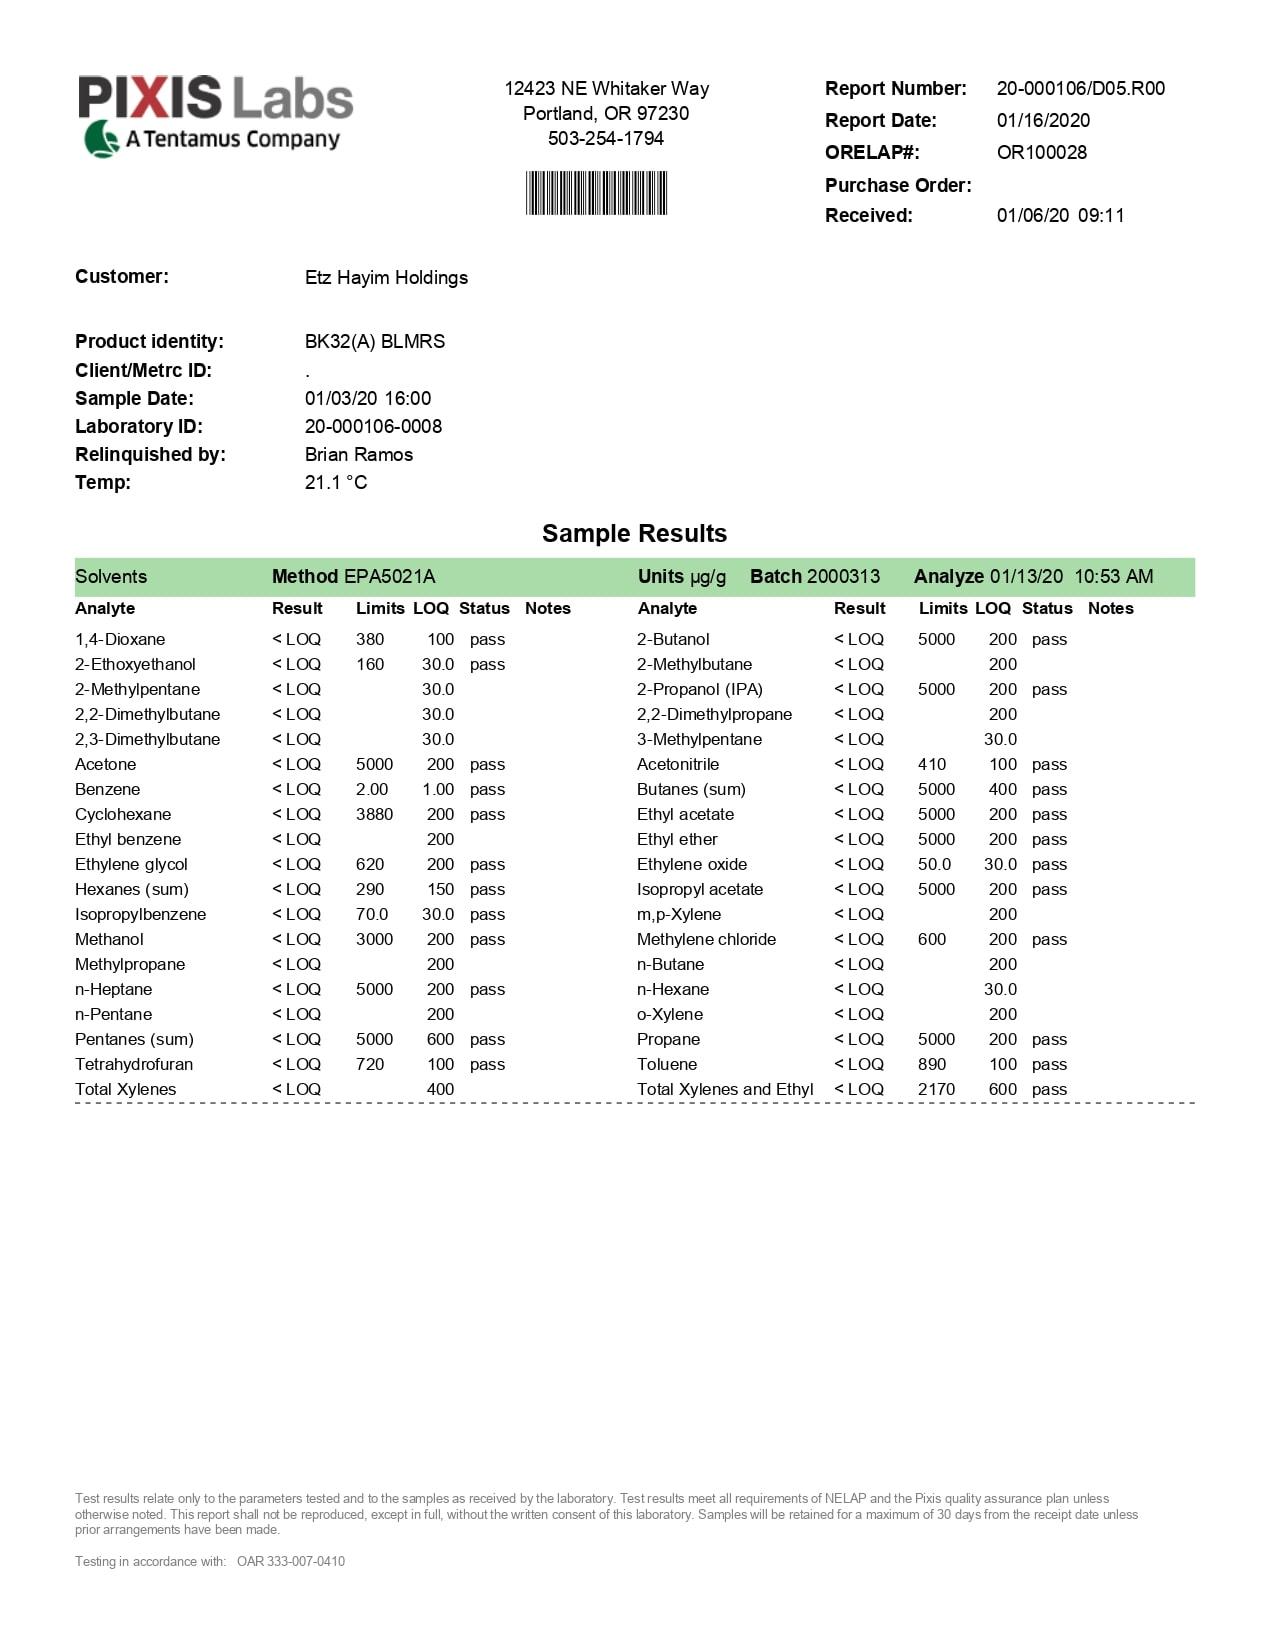 Lazarus Naturals CBD Balm Portland Rose Lab Report